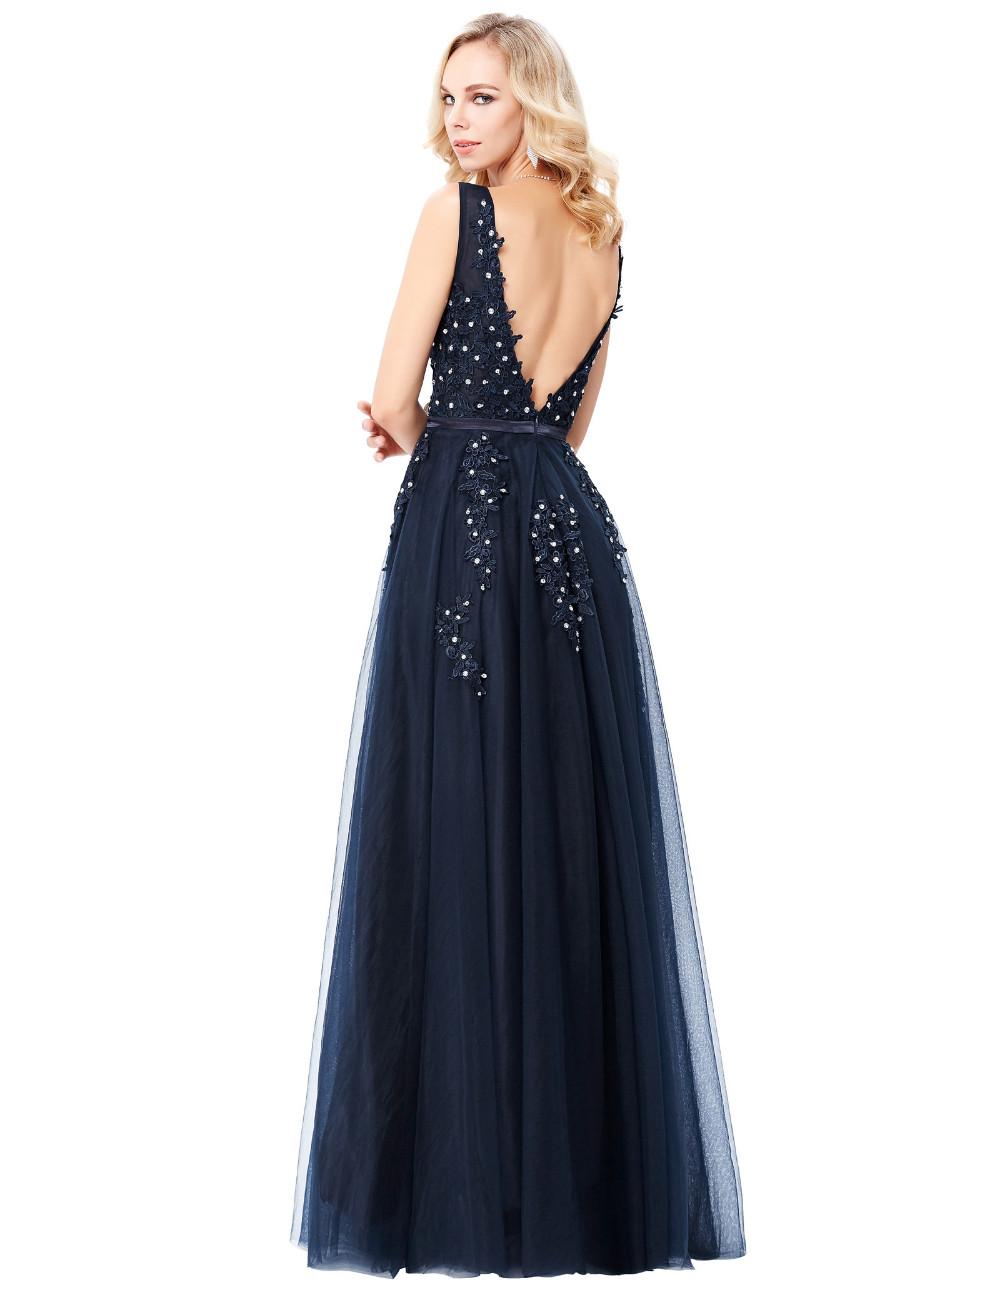 Grace Karin Tulle Appliques Celebrity Prom Dress Sexy V Back Sleeveless Long Royal Blue Robes De Soiree 2017 Longue Prom Dresses 14